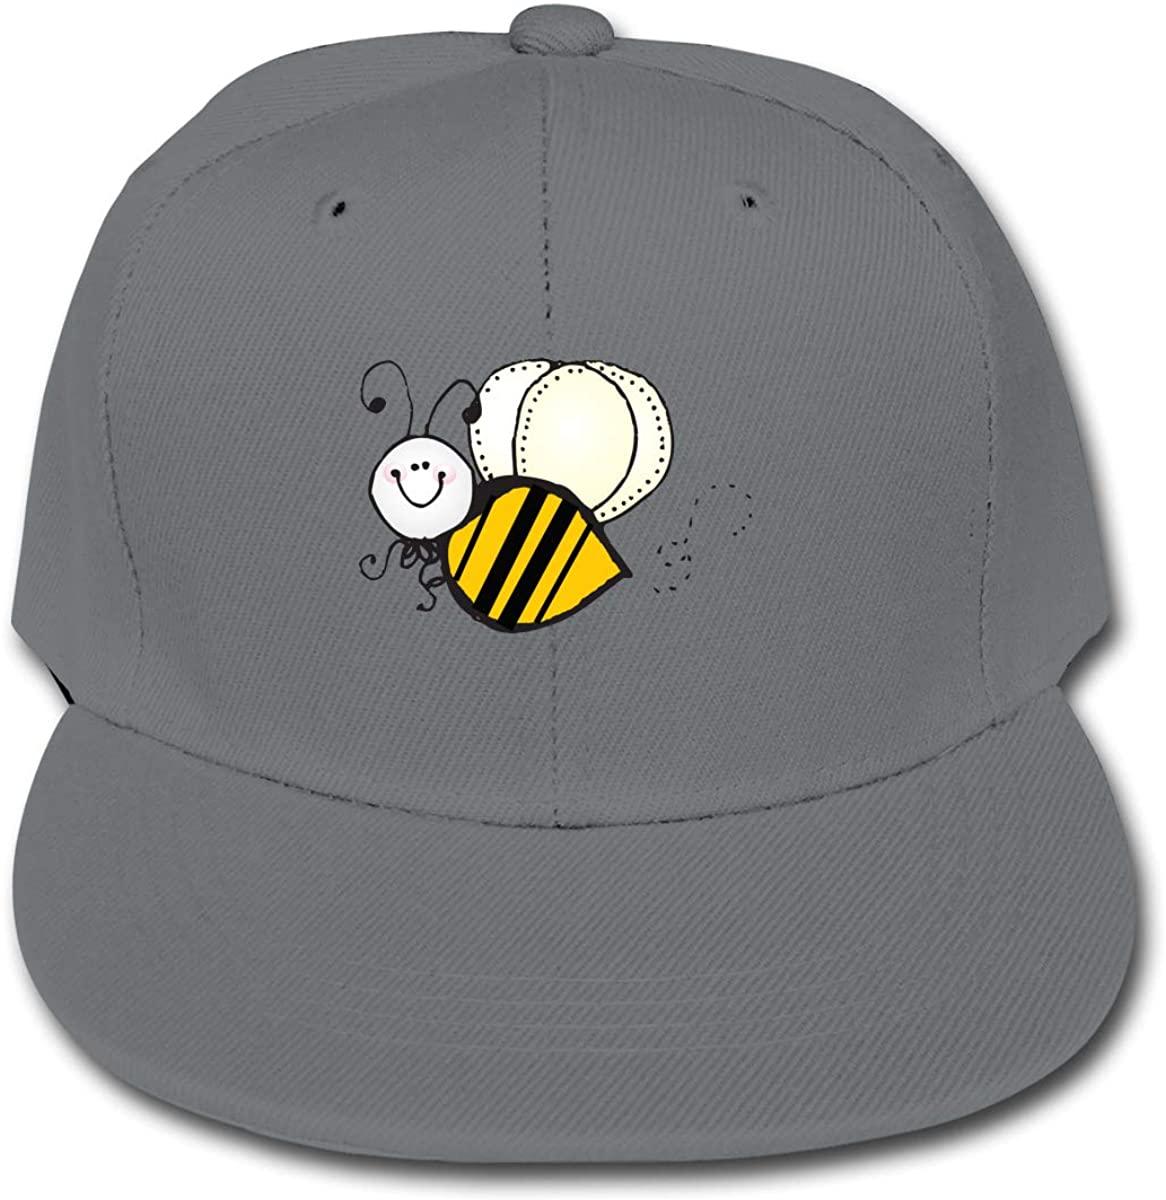 FHdbing Cute Bumblebee Adjustable Baseball Cap Hip Hop for Child